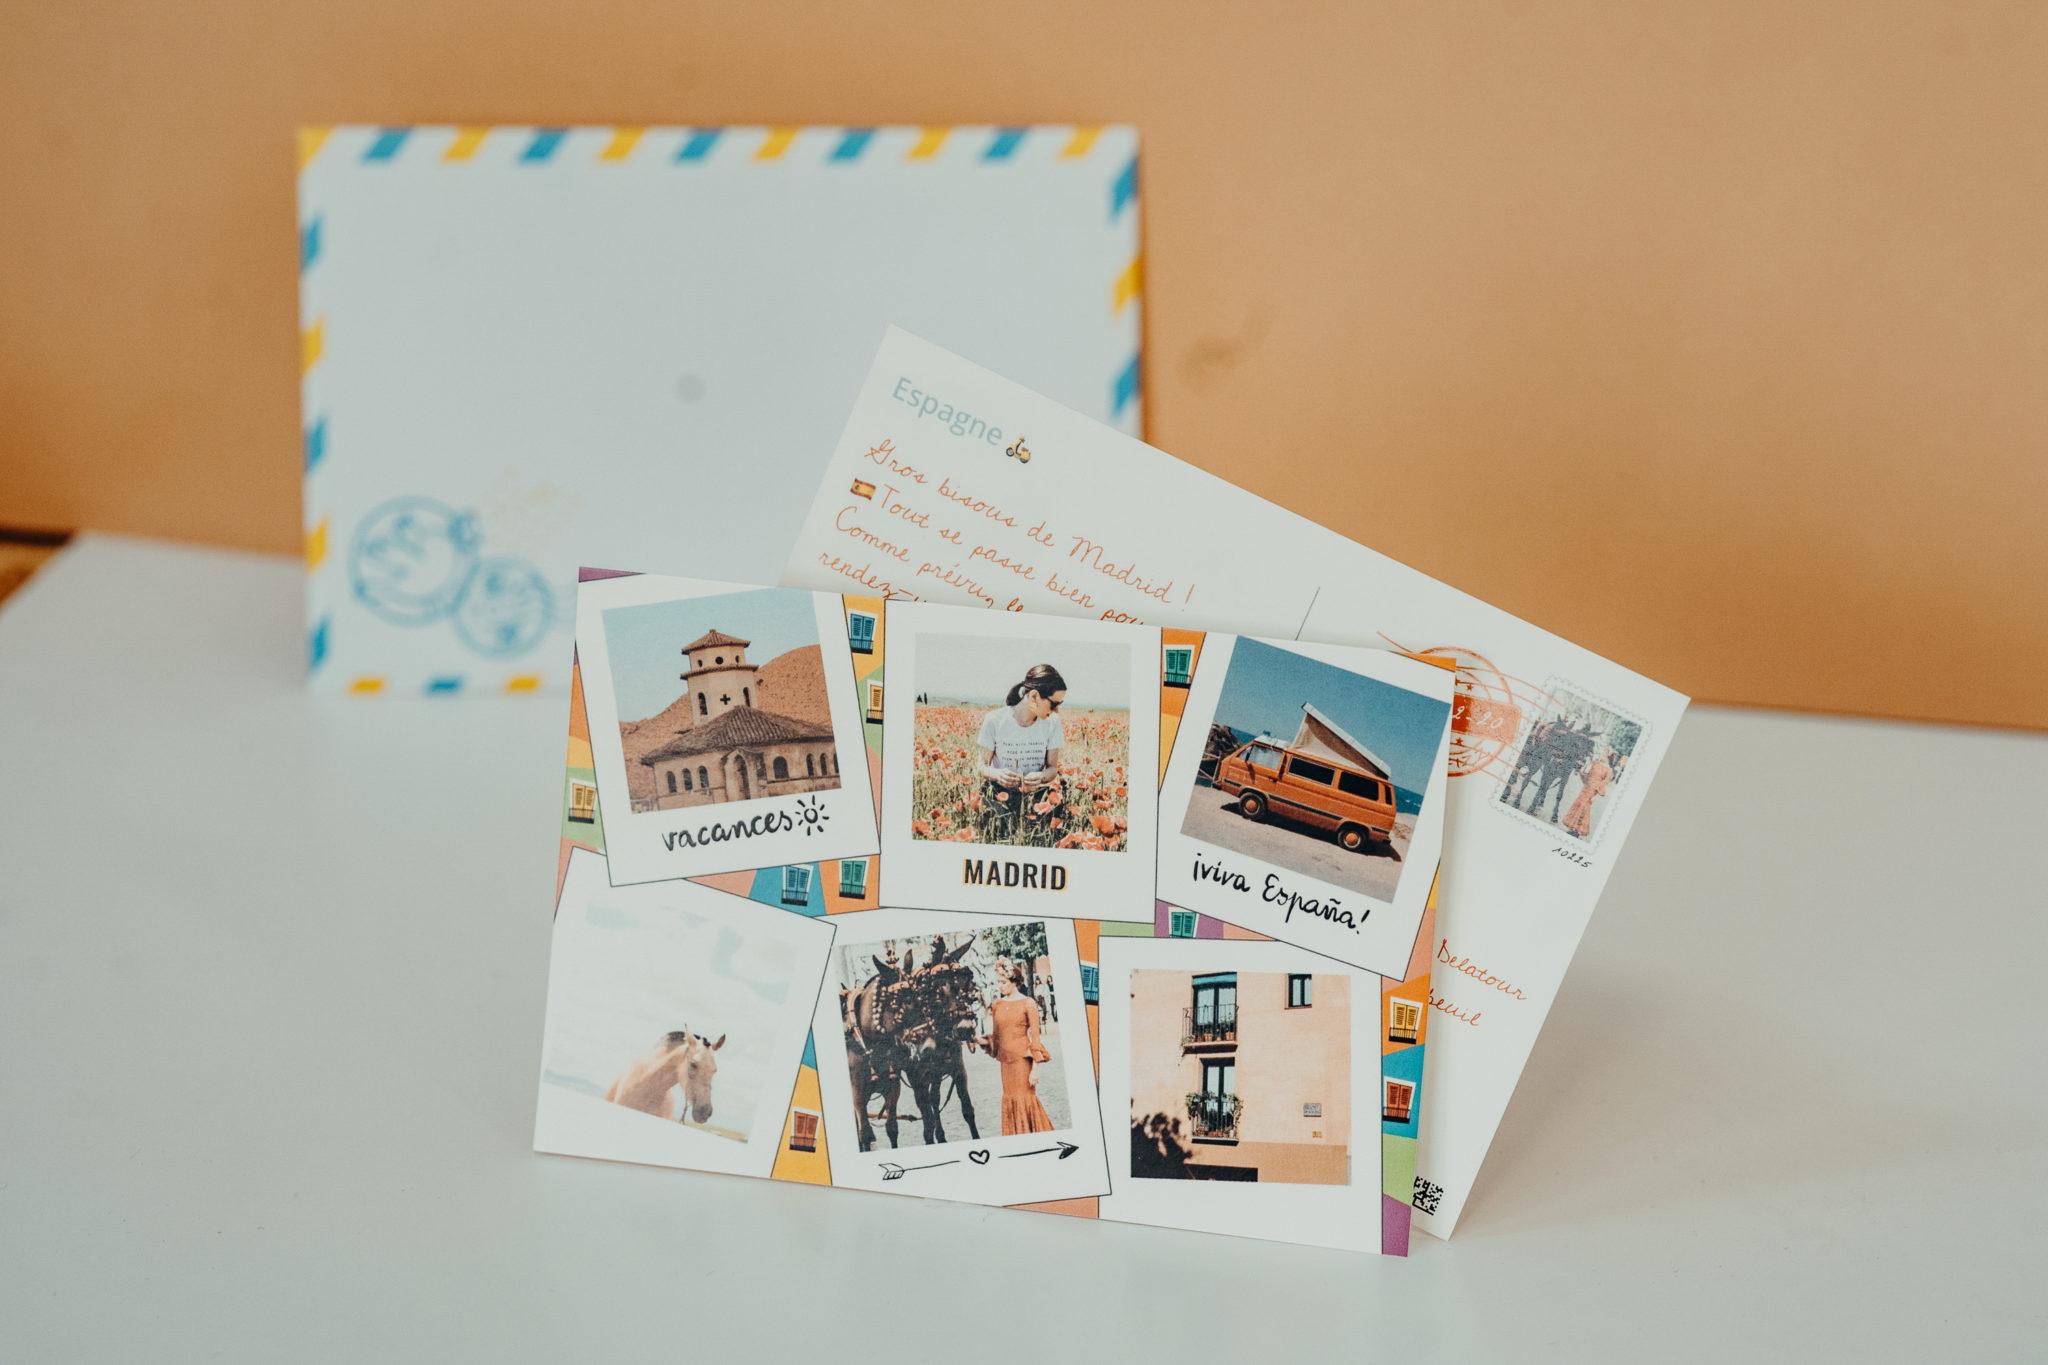 carte postale espagne barcelone